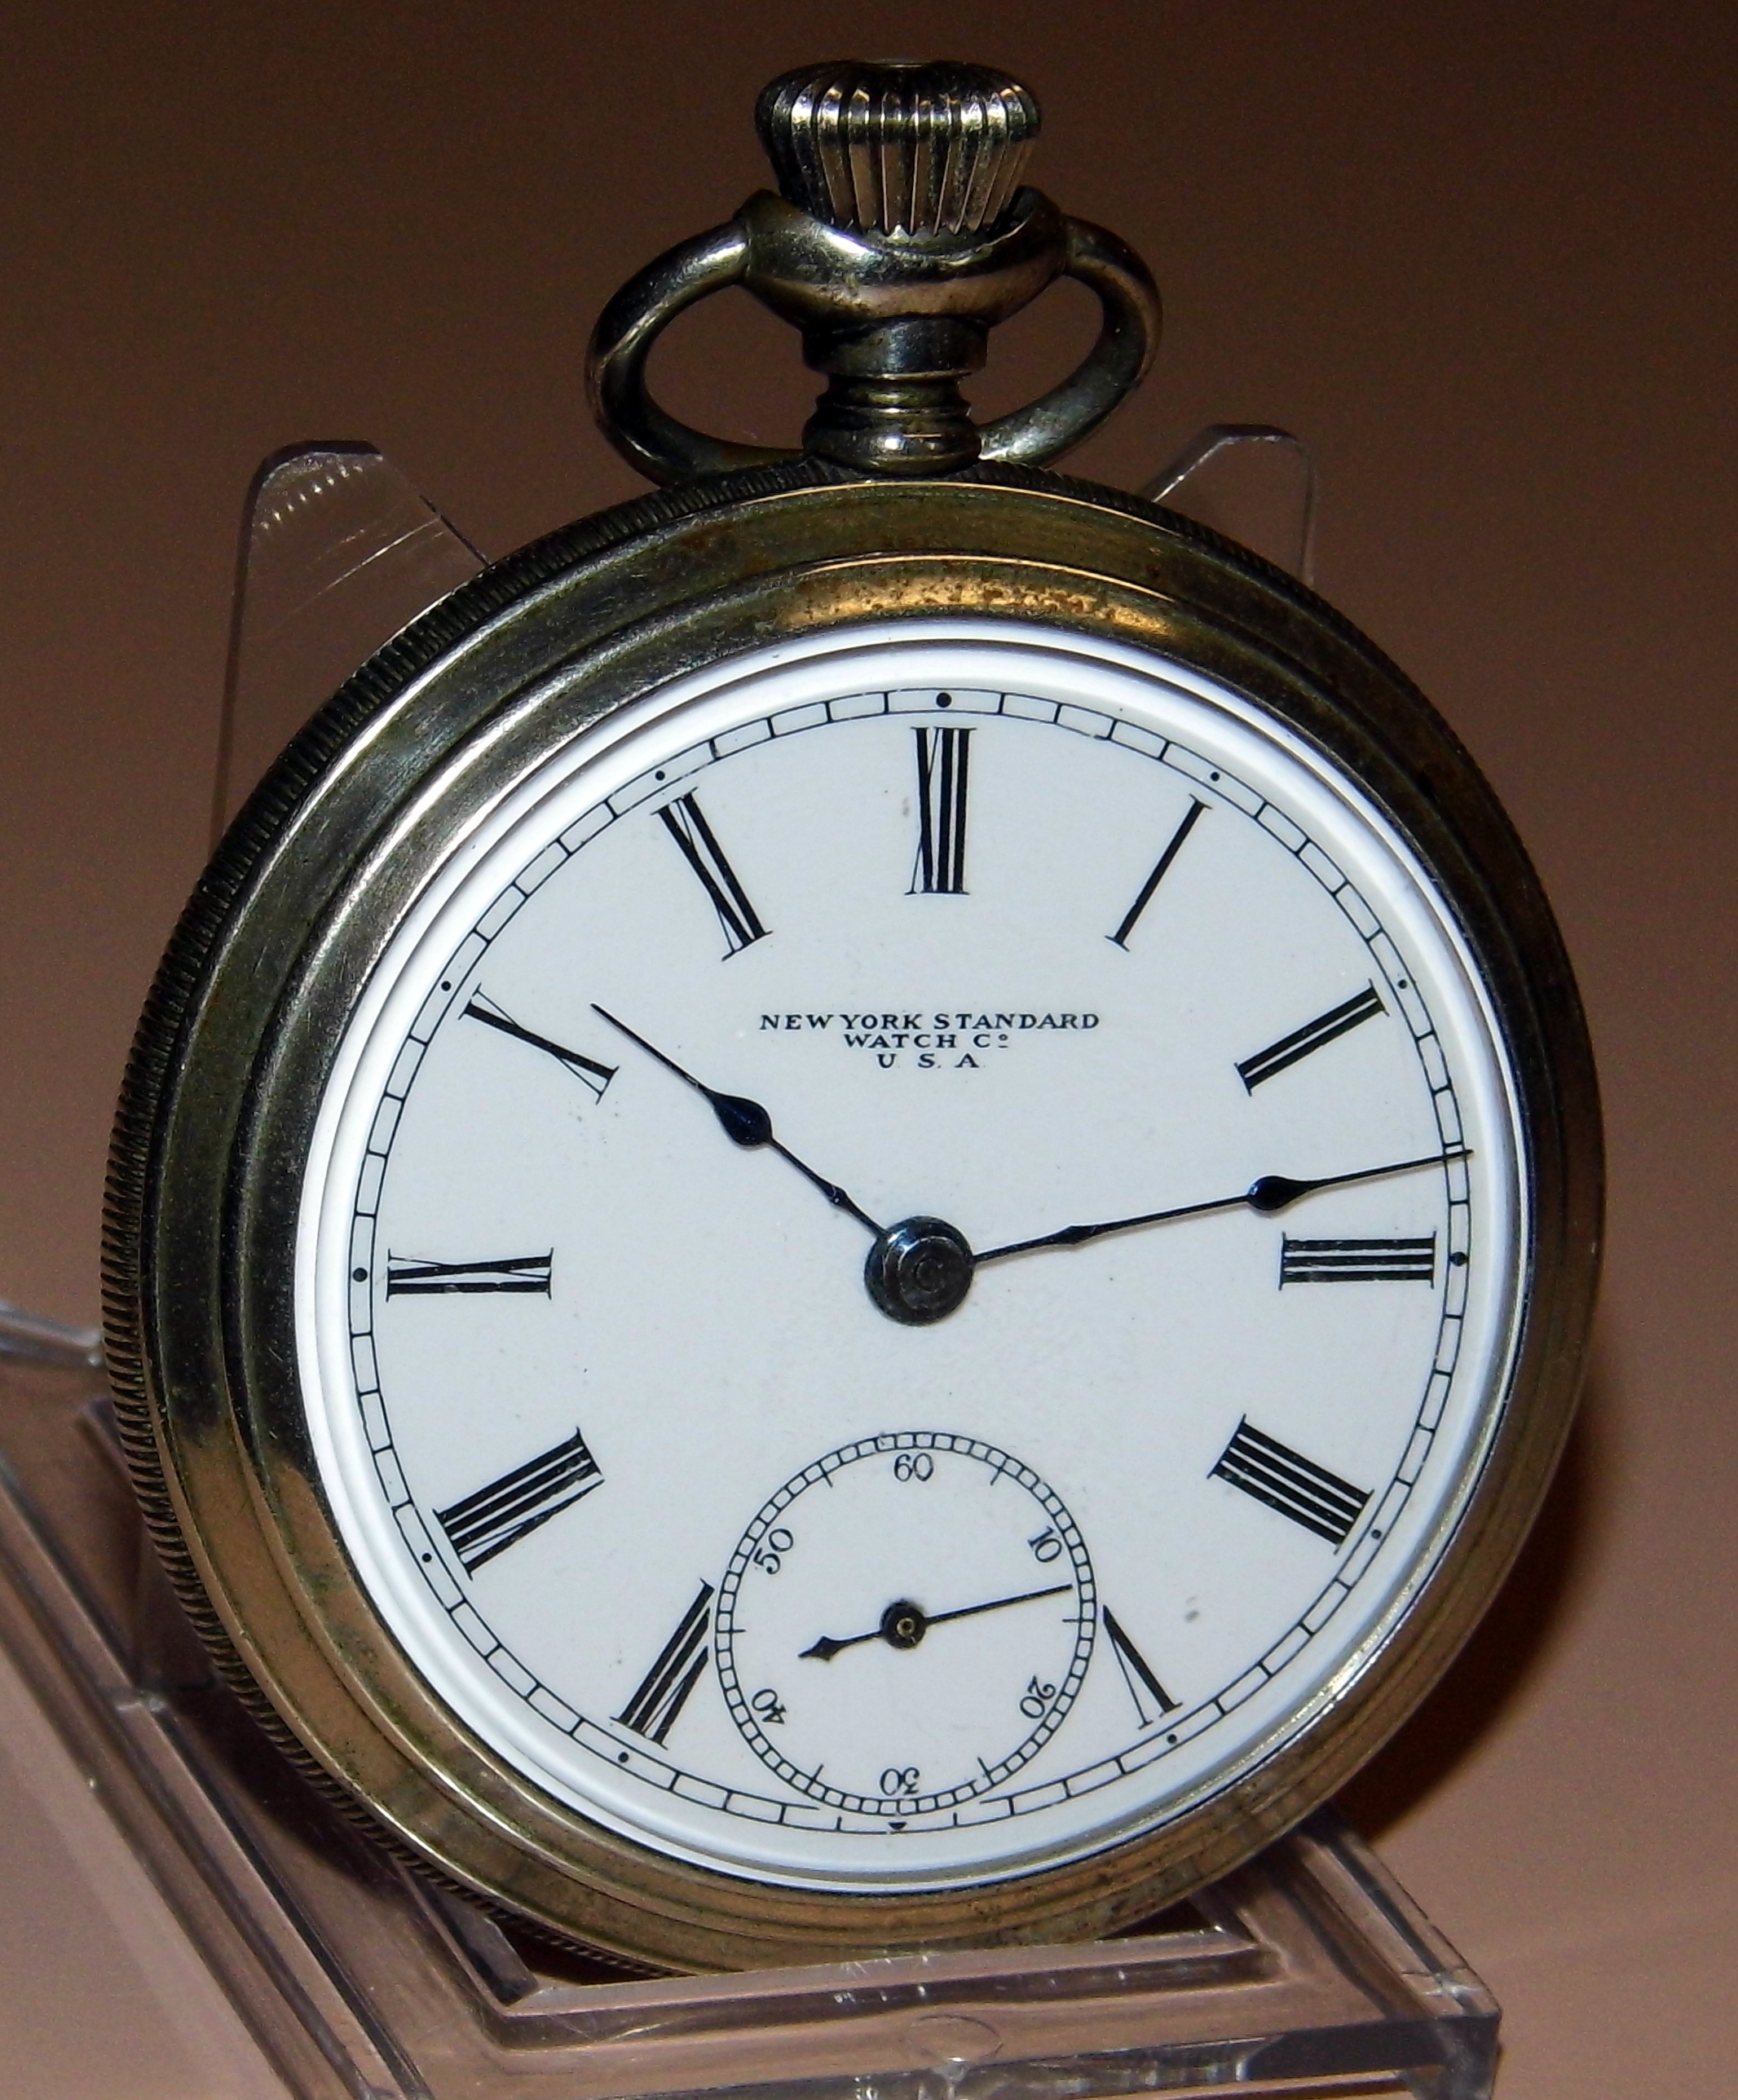 Dating new york standard pocket watch - matt boggs why men pull away when dating